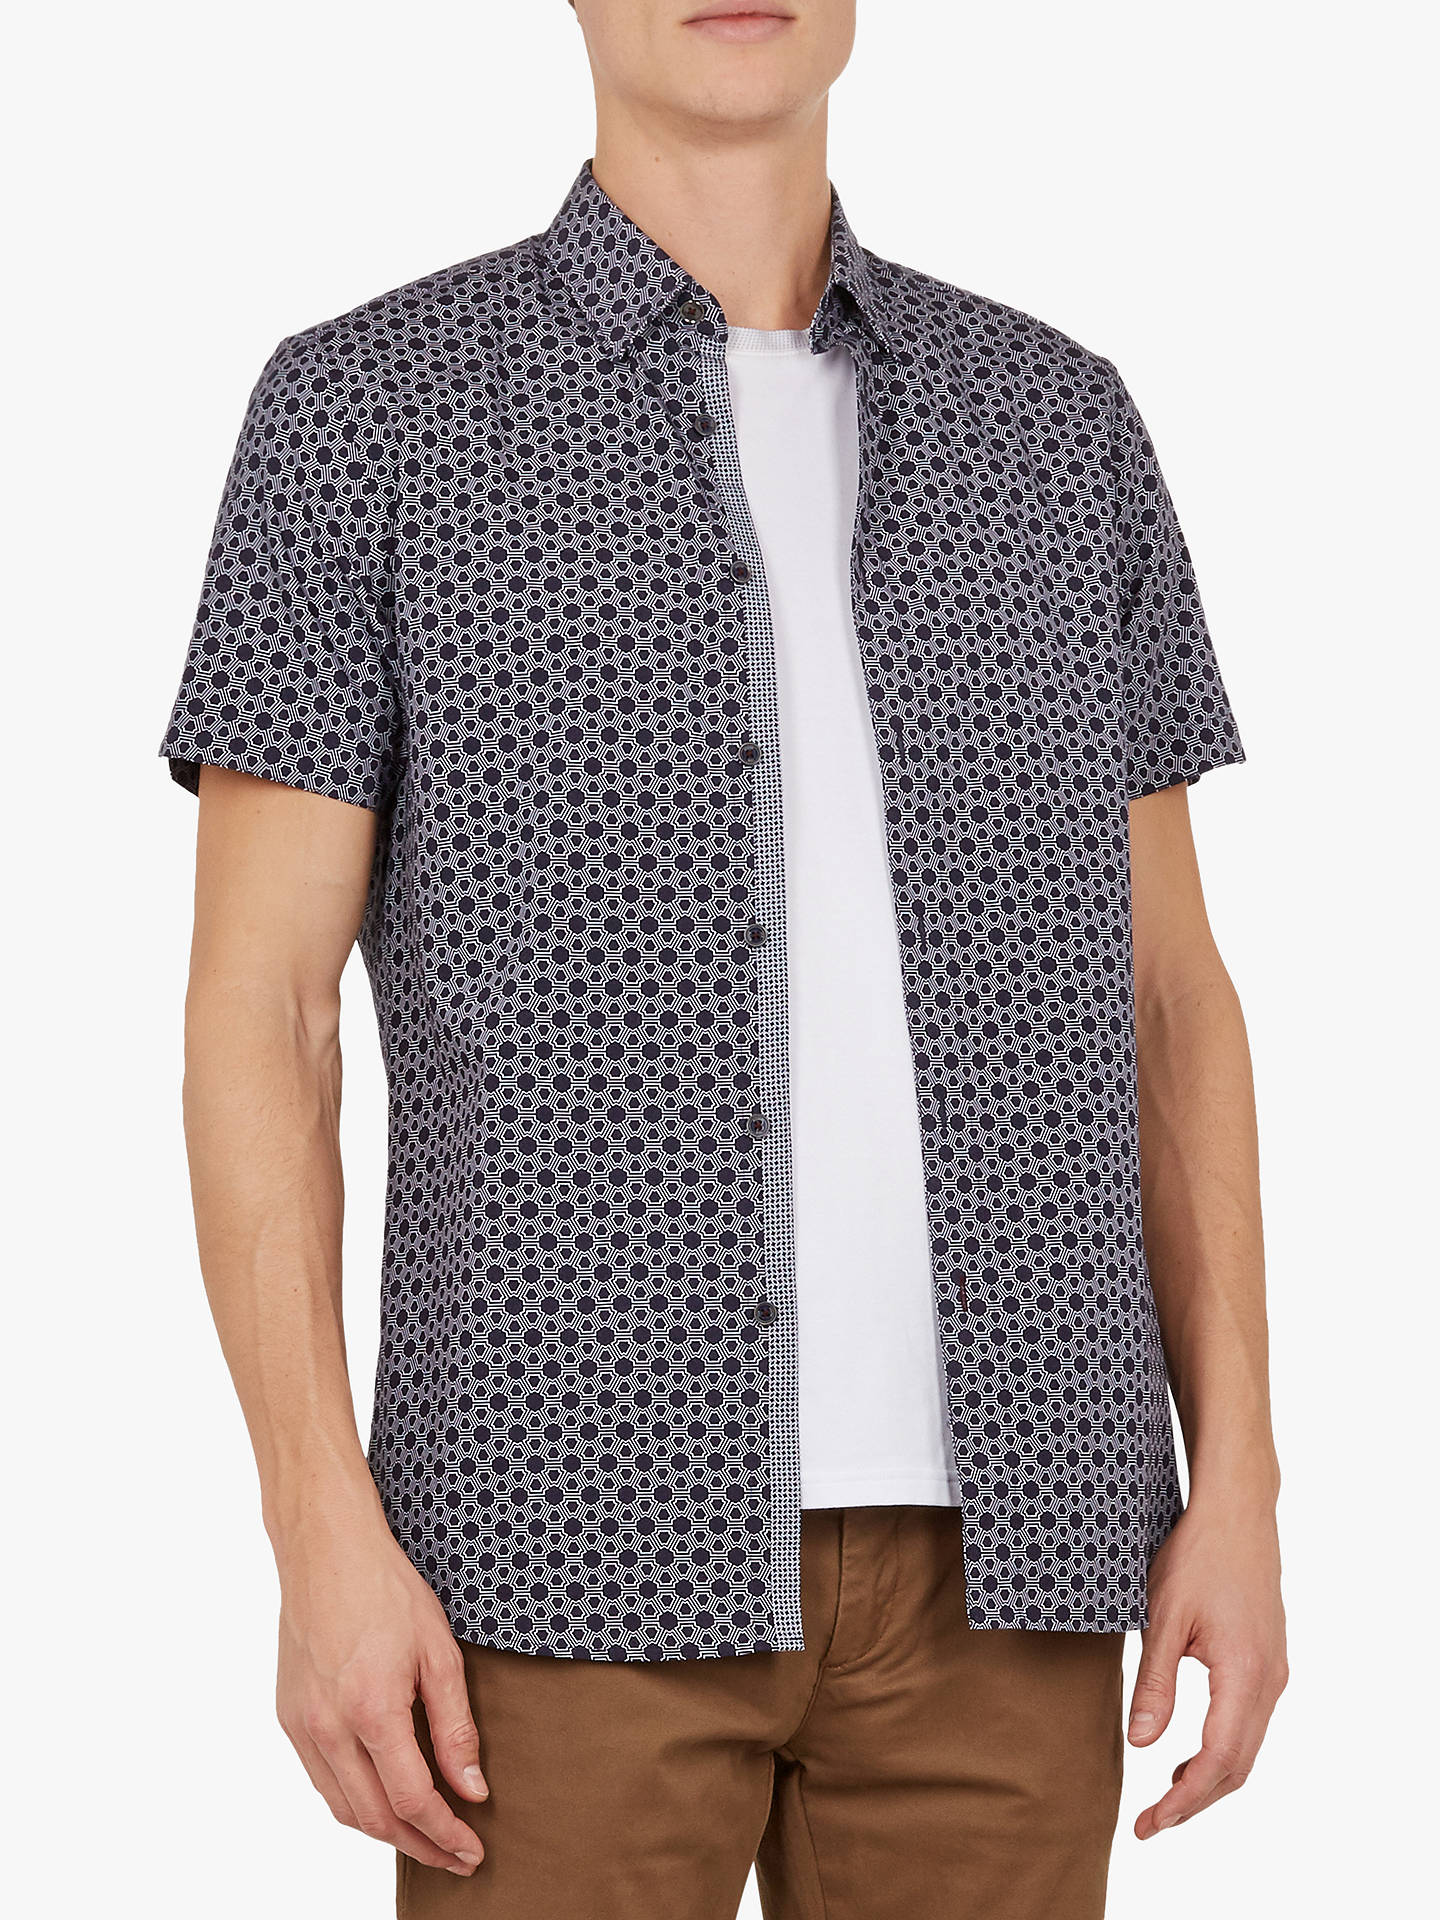 1d2c2d83f3a858 Ted Baker Enyone Short Sleeve Printed Shirt at John Lewis   Partners